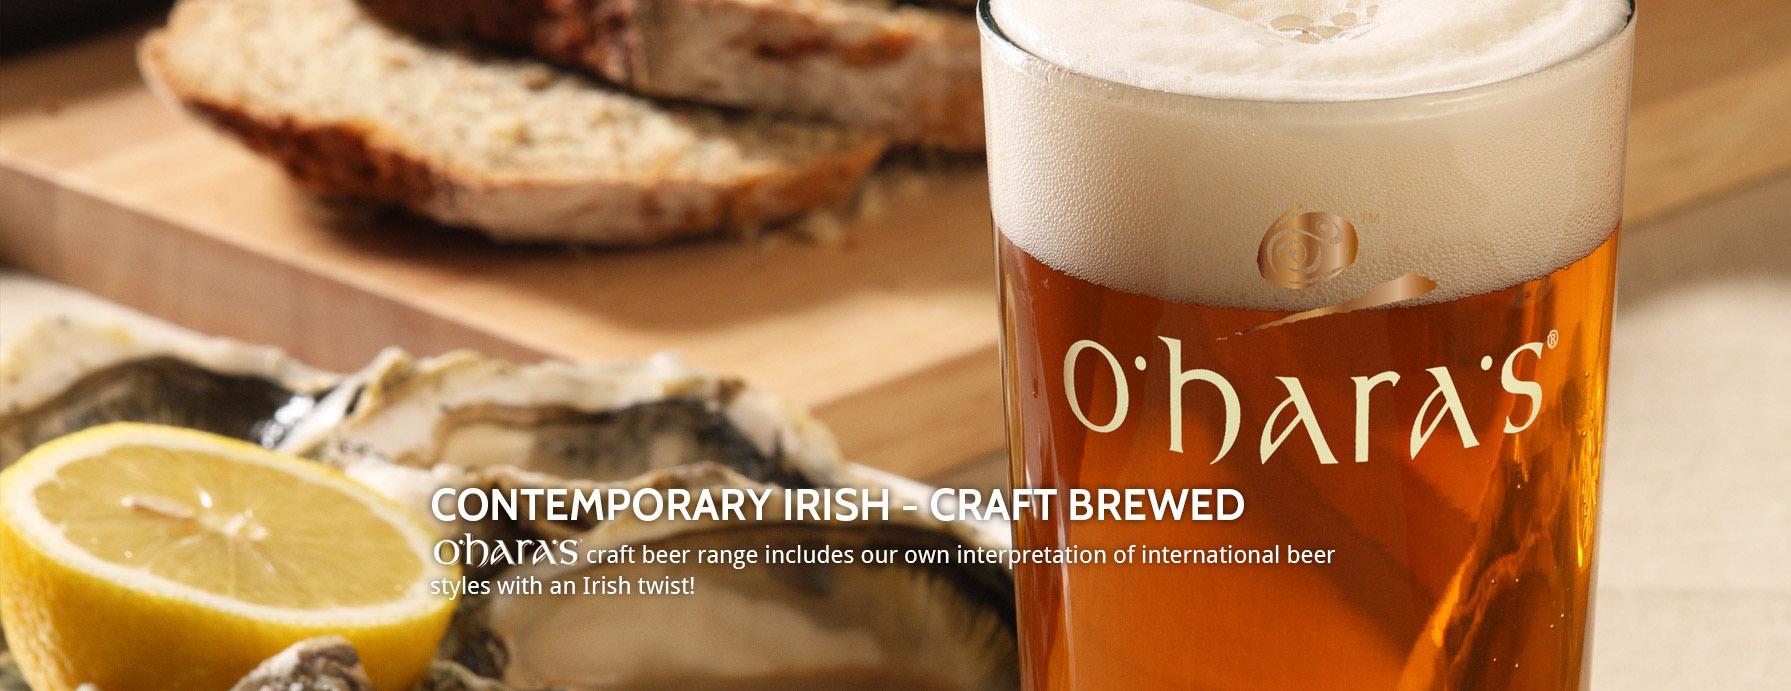 Home-Page-Contemporary-Irish-Craft-Brews-43